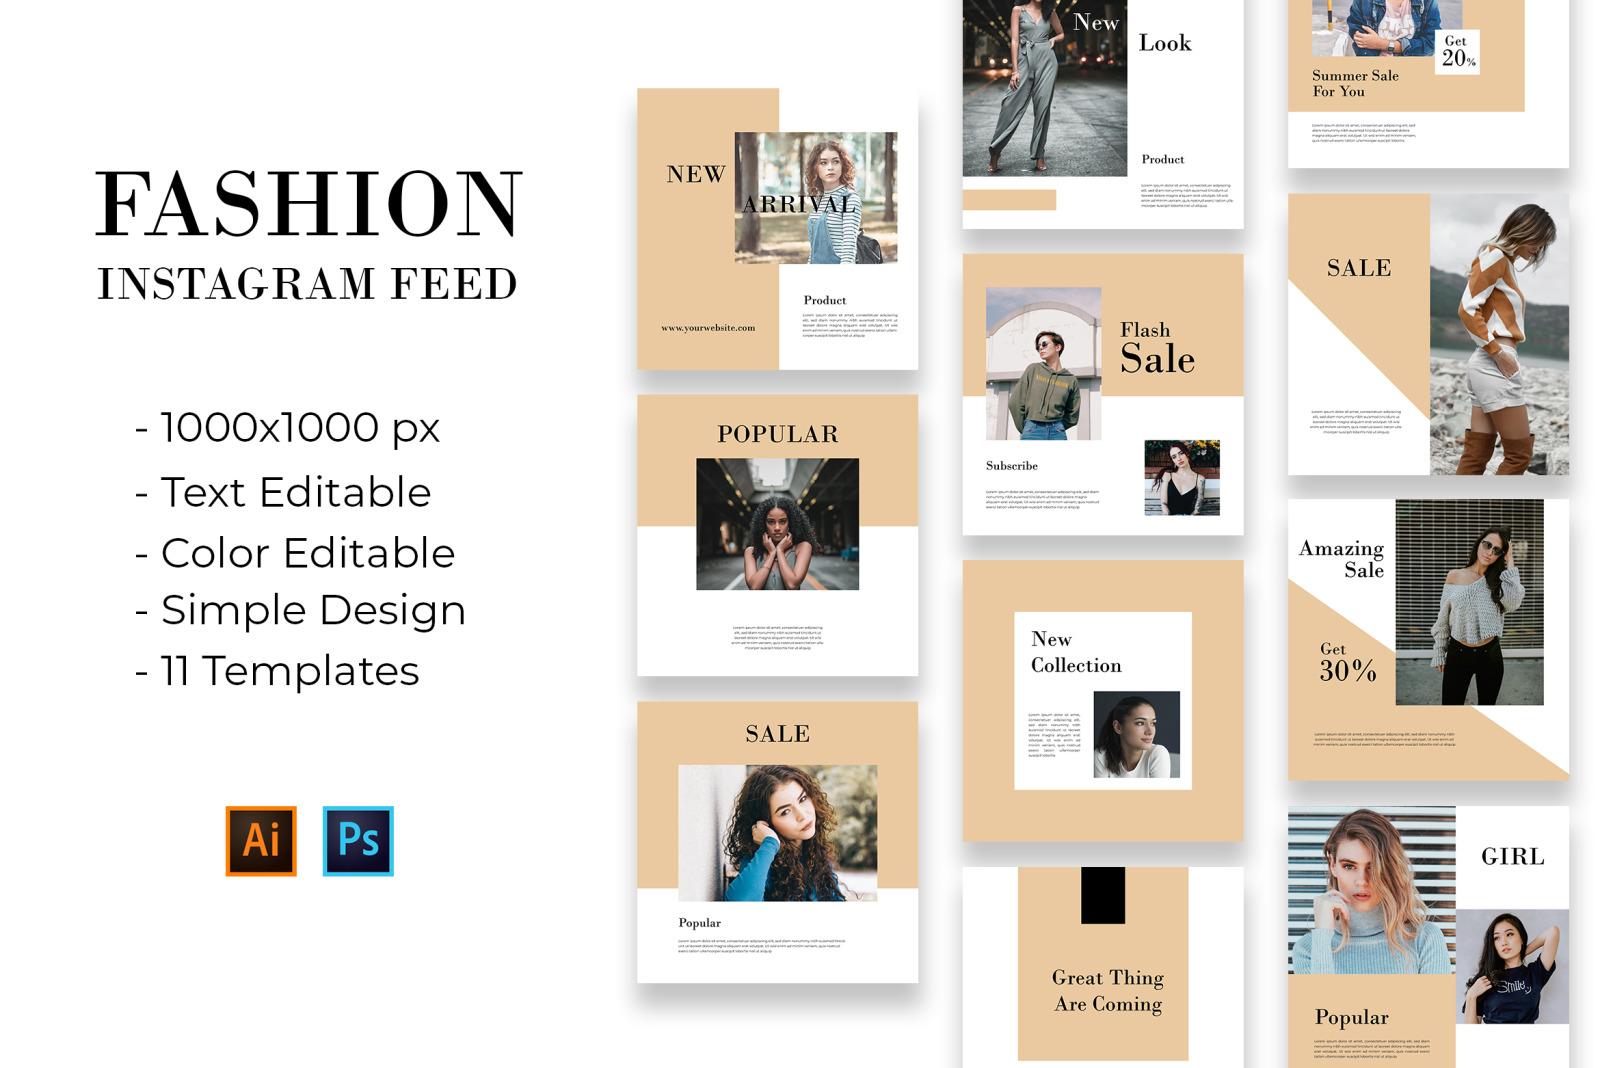 Fashion Intagram Feed Templates